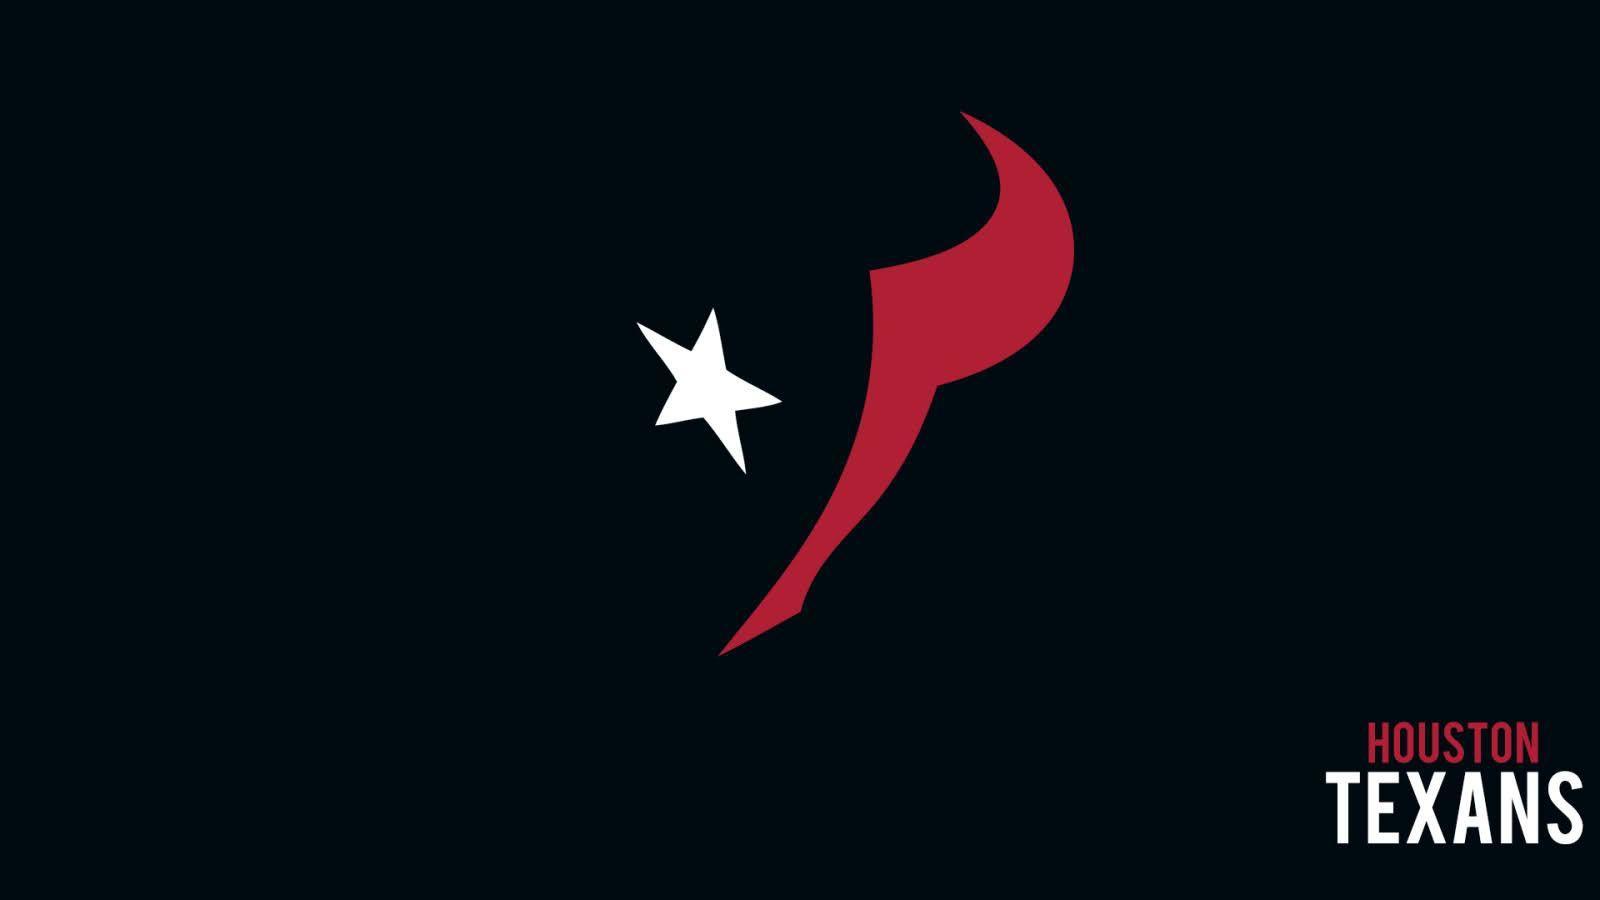 Houston Texans Wallpapers 1600x900